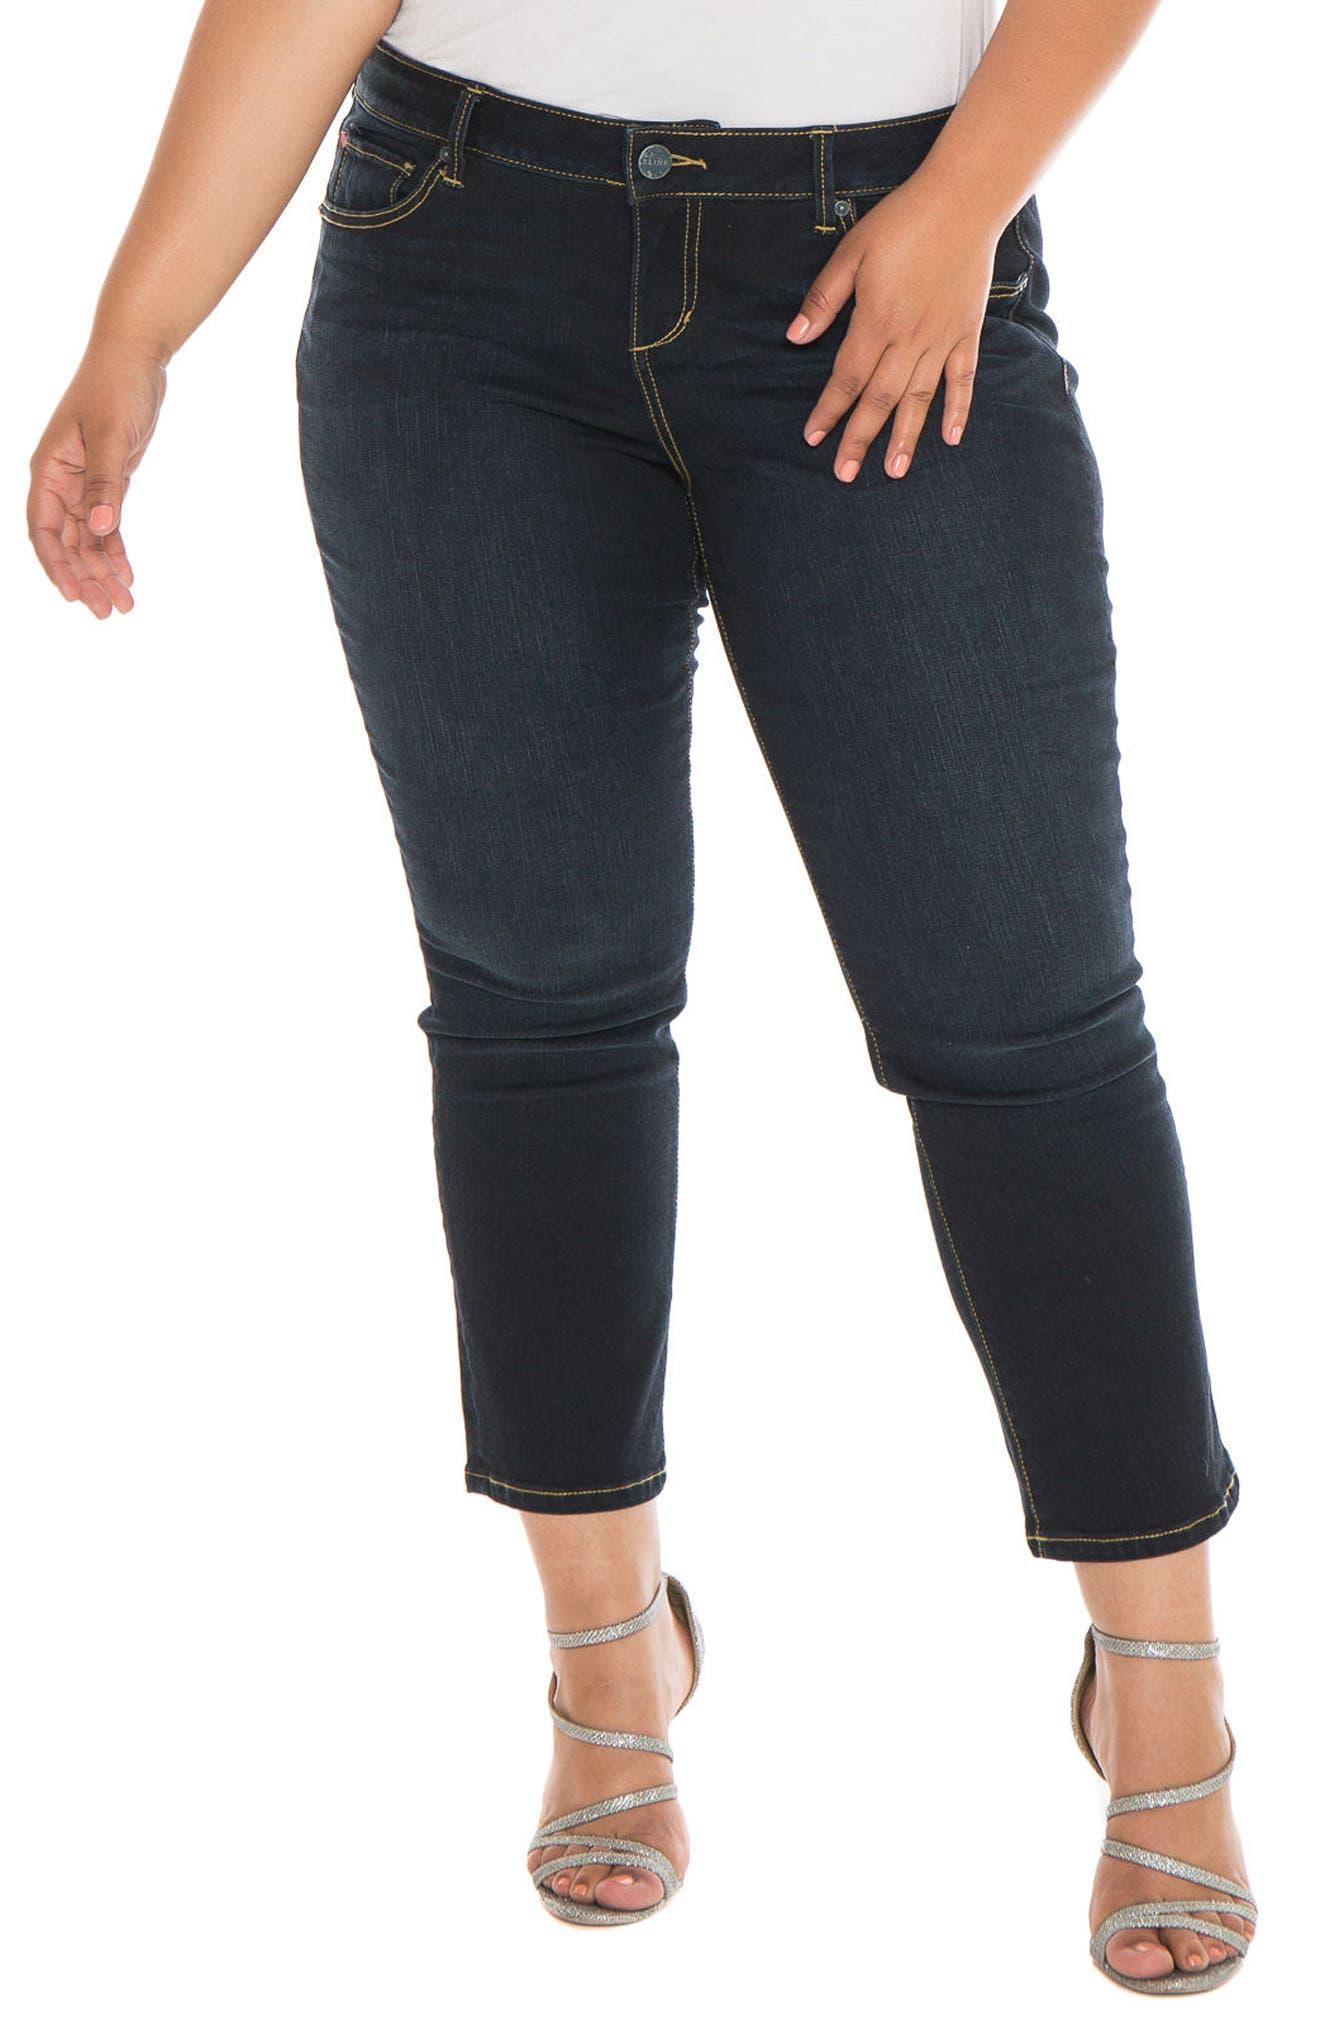 Main Image - SLINK Jeans Straight Leg Jeans (Summer) (Plus Size)